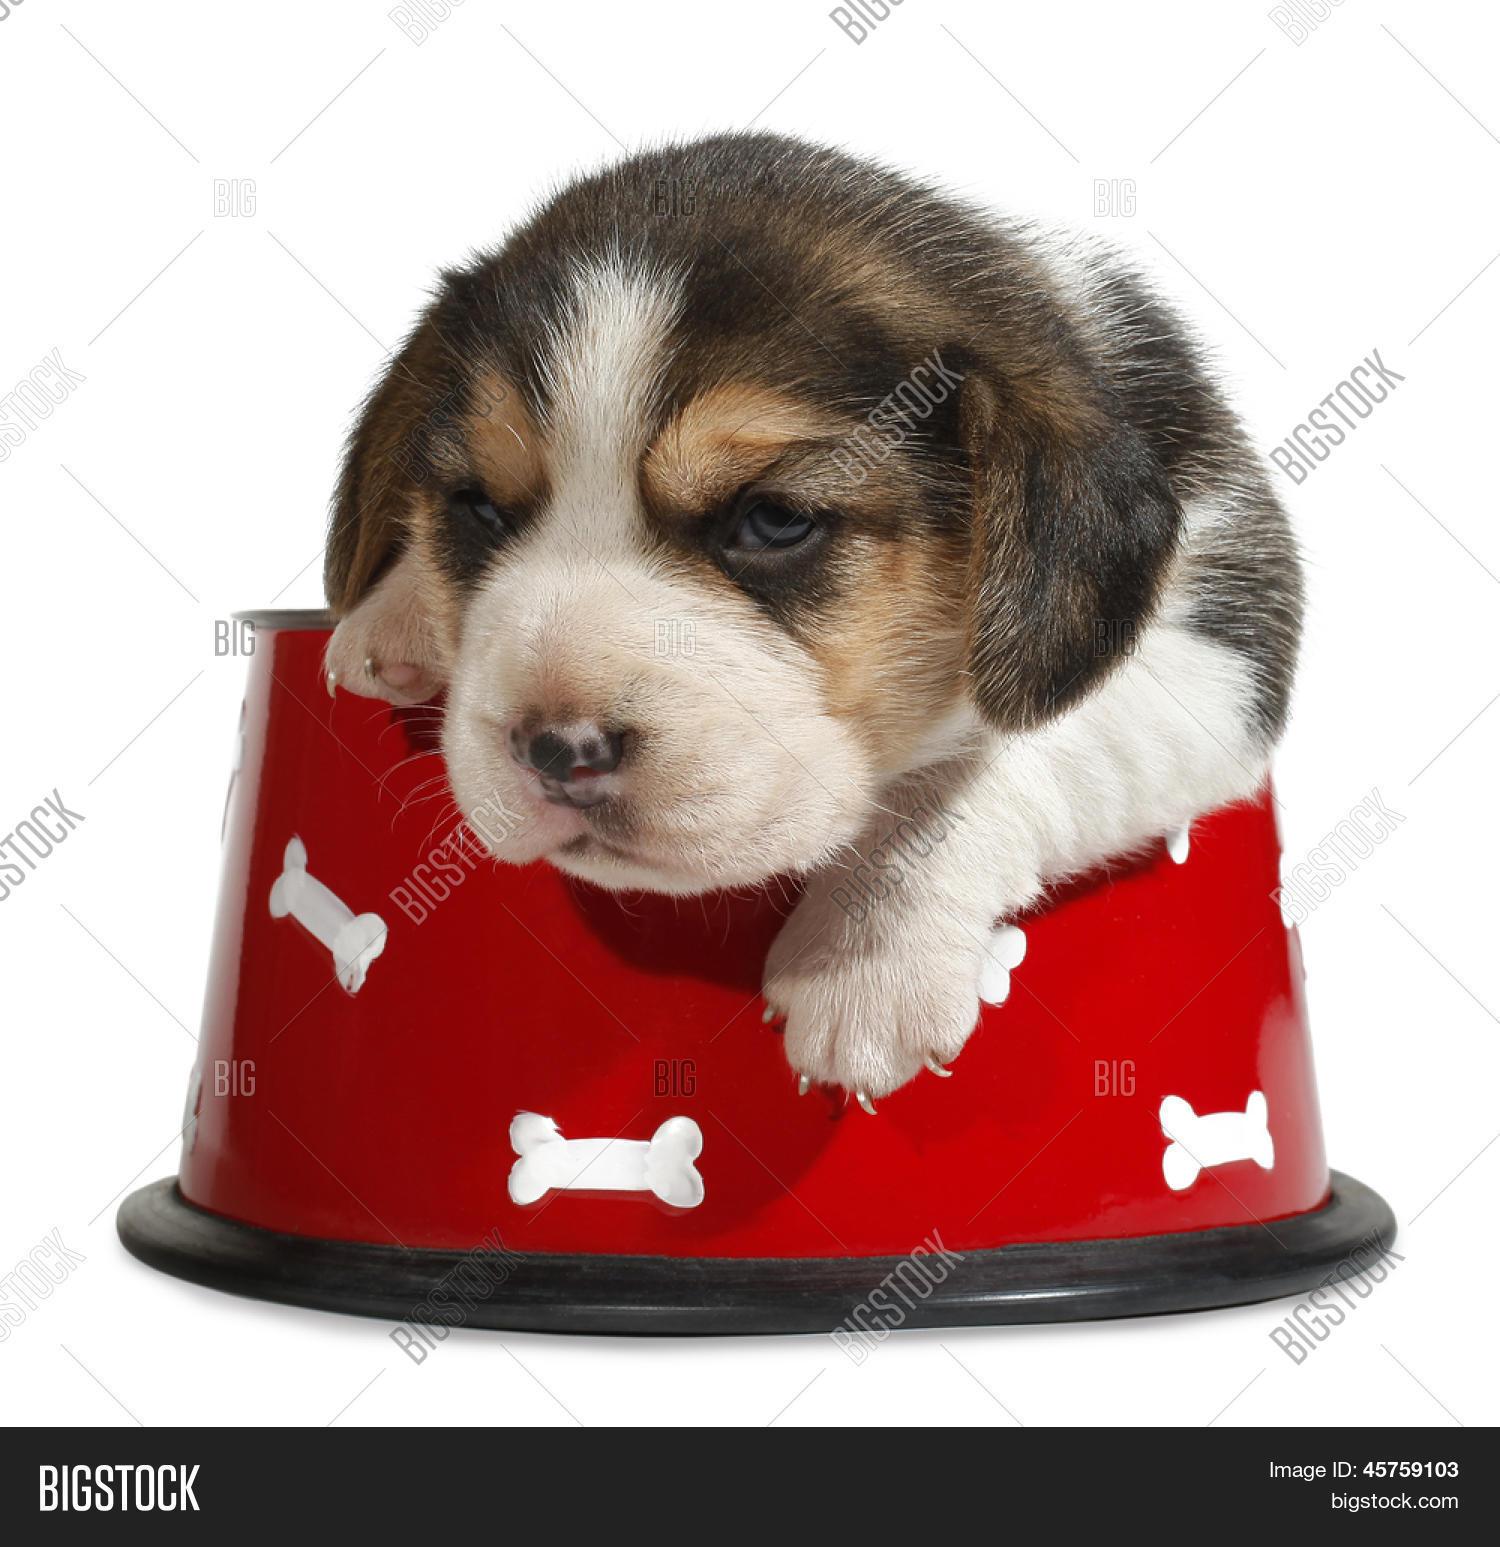 Beagle Puppy Red Dog Image Photo Free Trial Bigstock